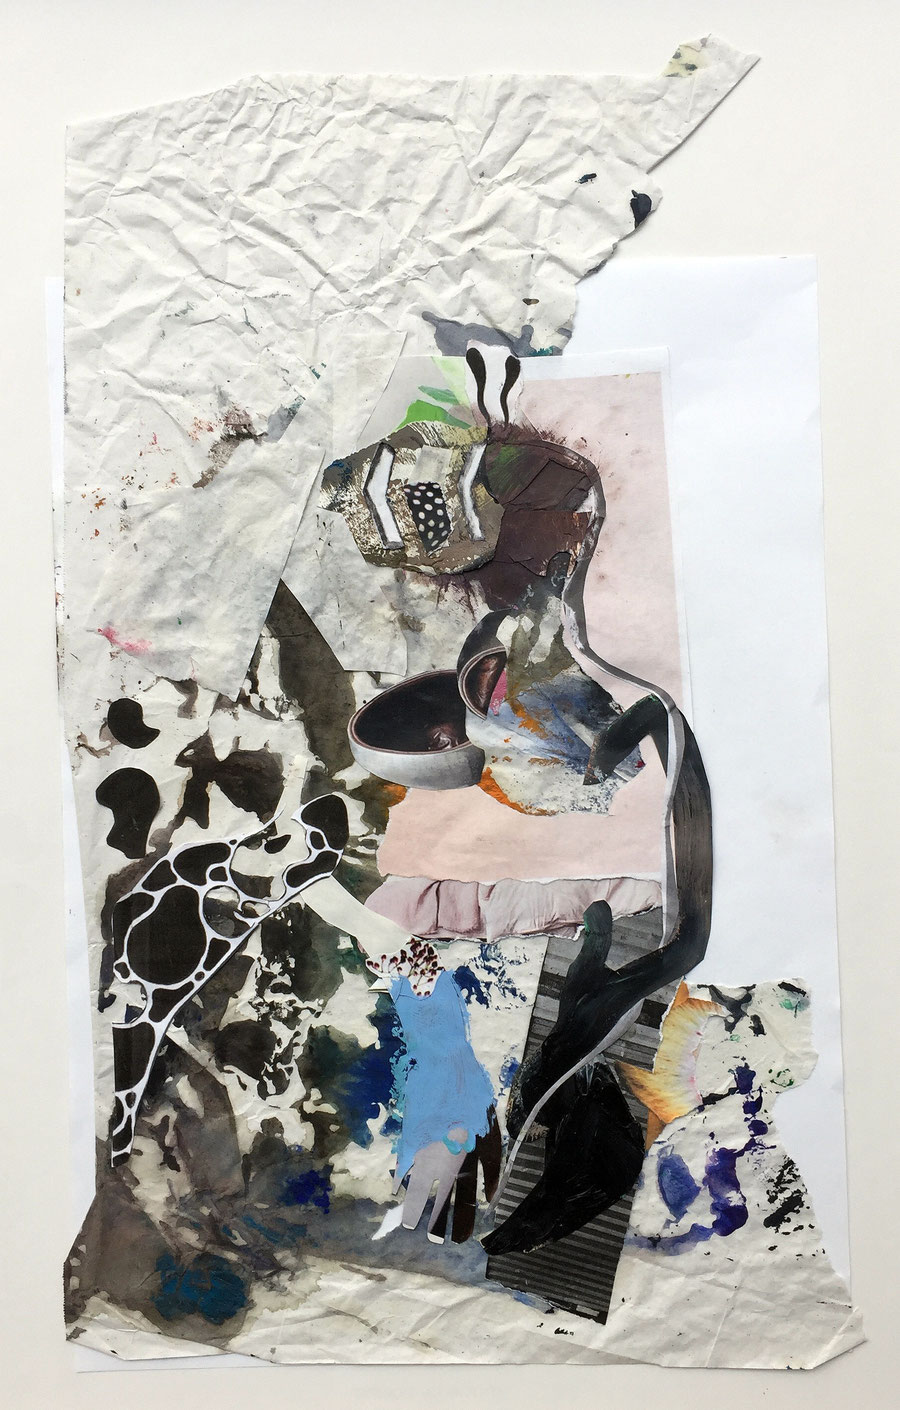 Gesine_Englert_#009.2017_collage, Malerei, Kunst, Paper-Work, Art, Painter, Malerin, Modern, Figur, Abstrakt, Flecken, Papier,